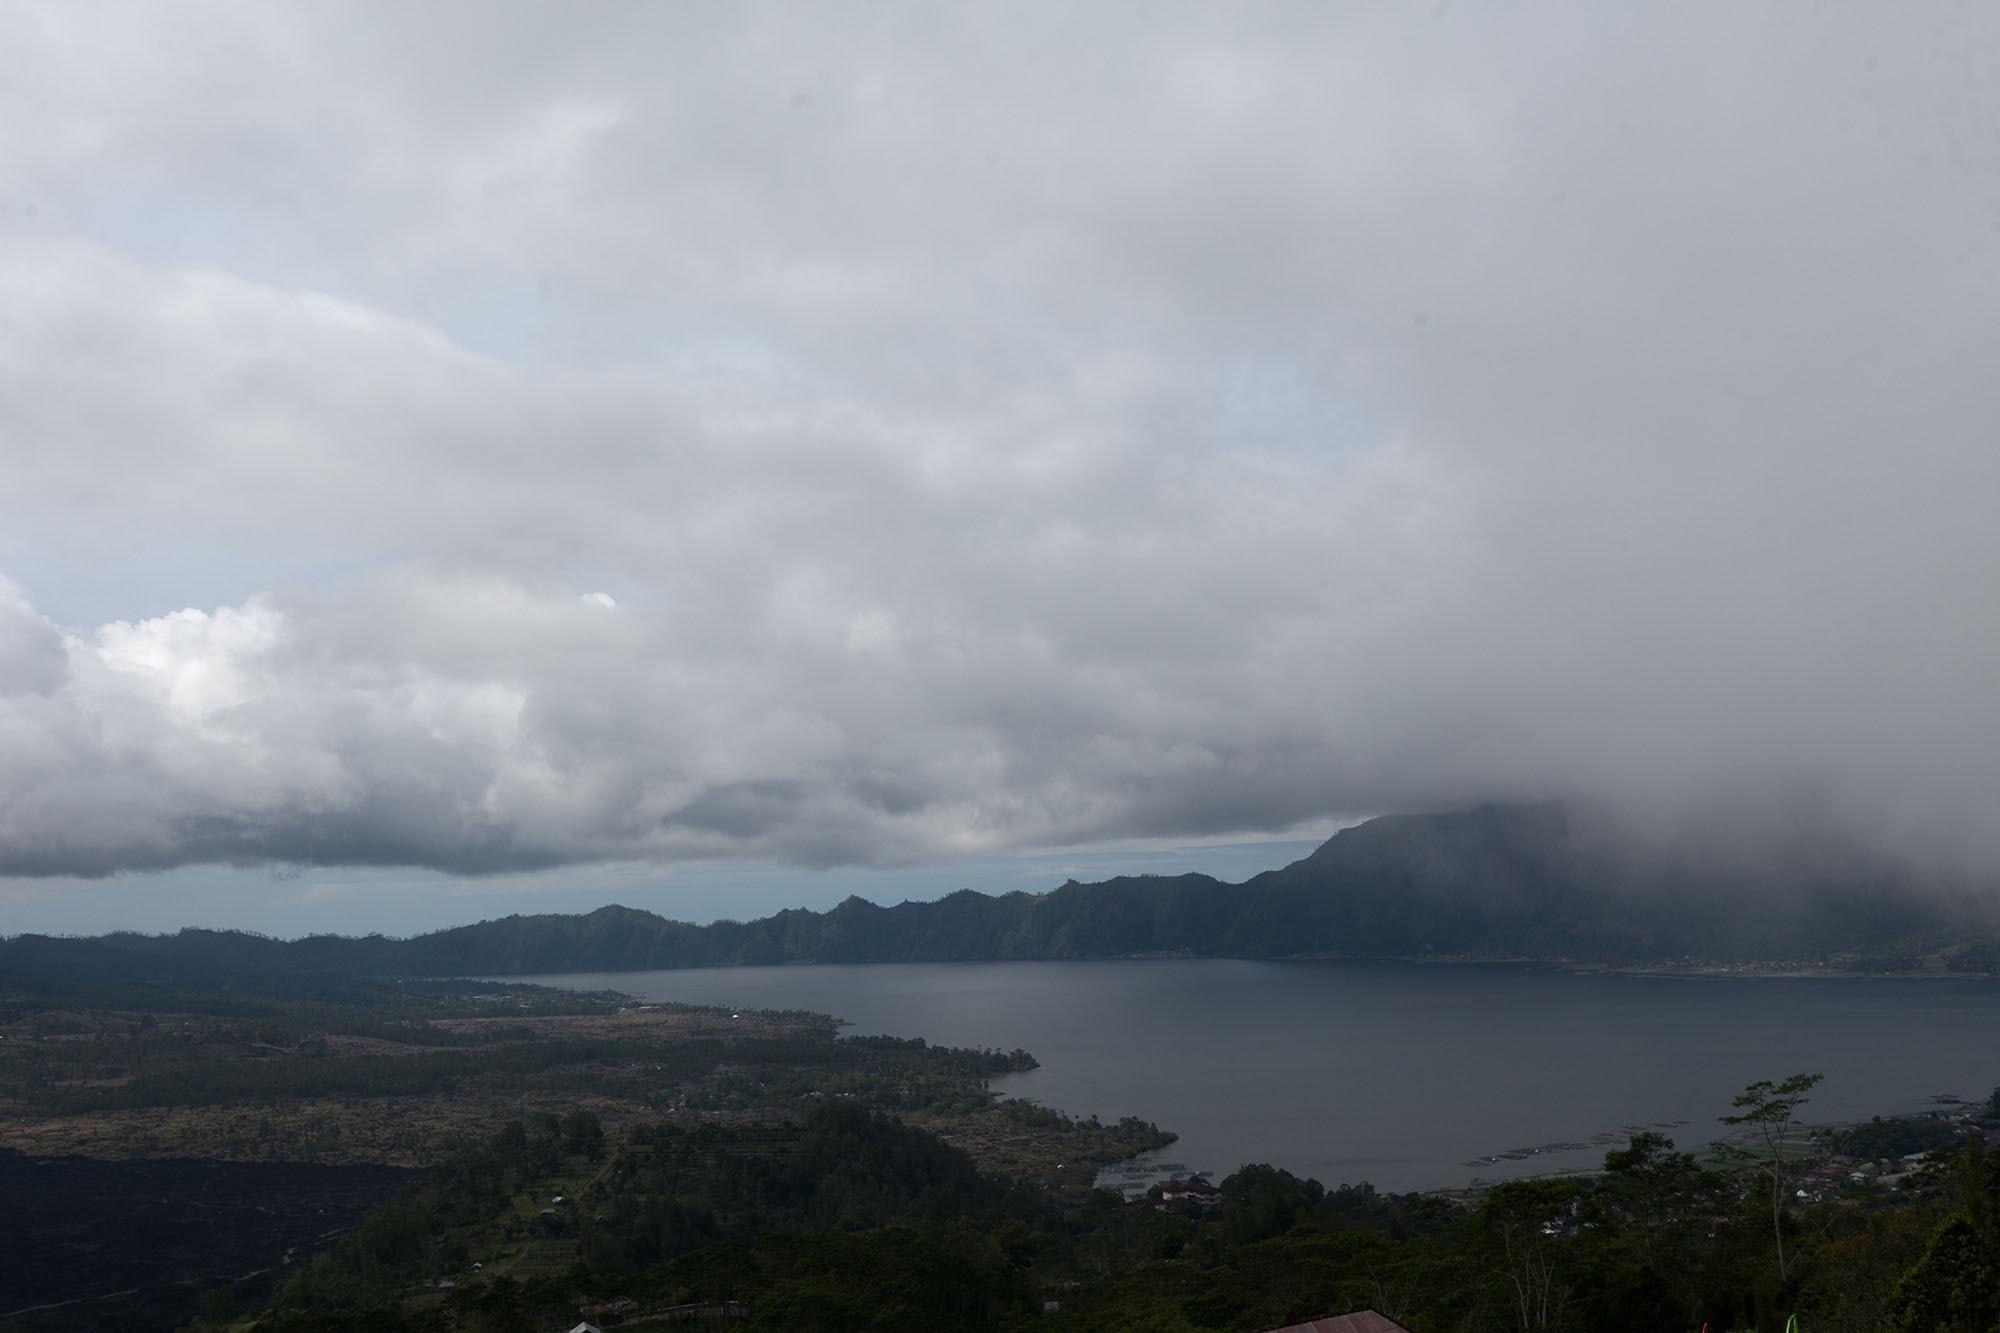 Gunung Batur Volcano in Bali, Indonesia